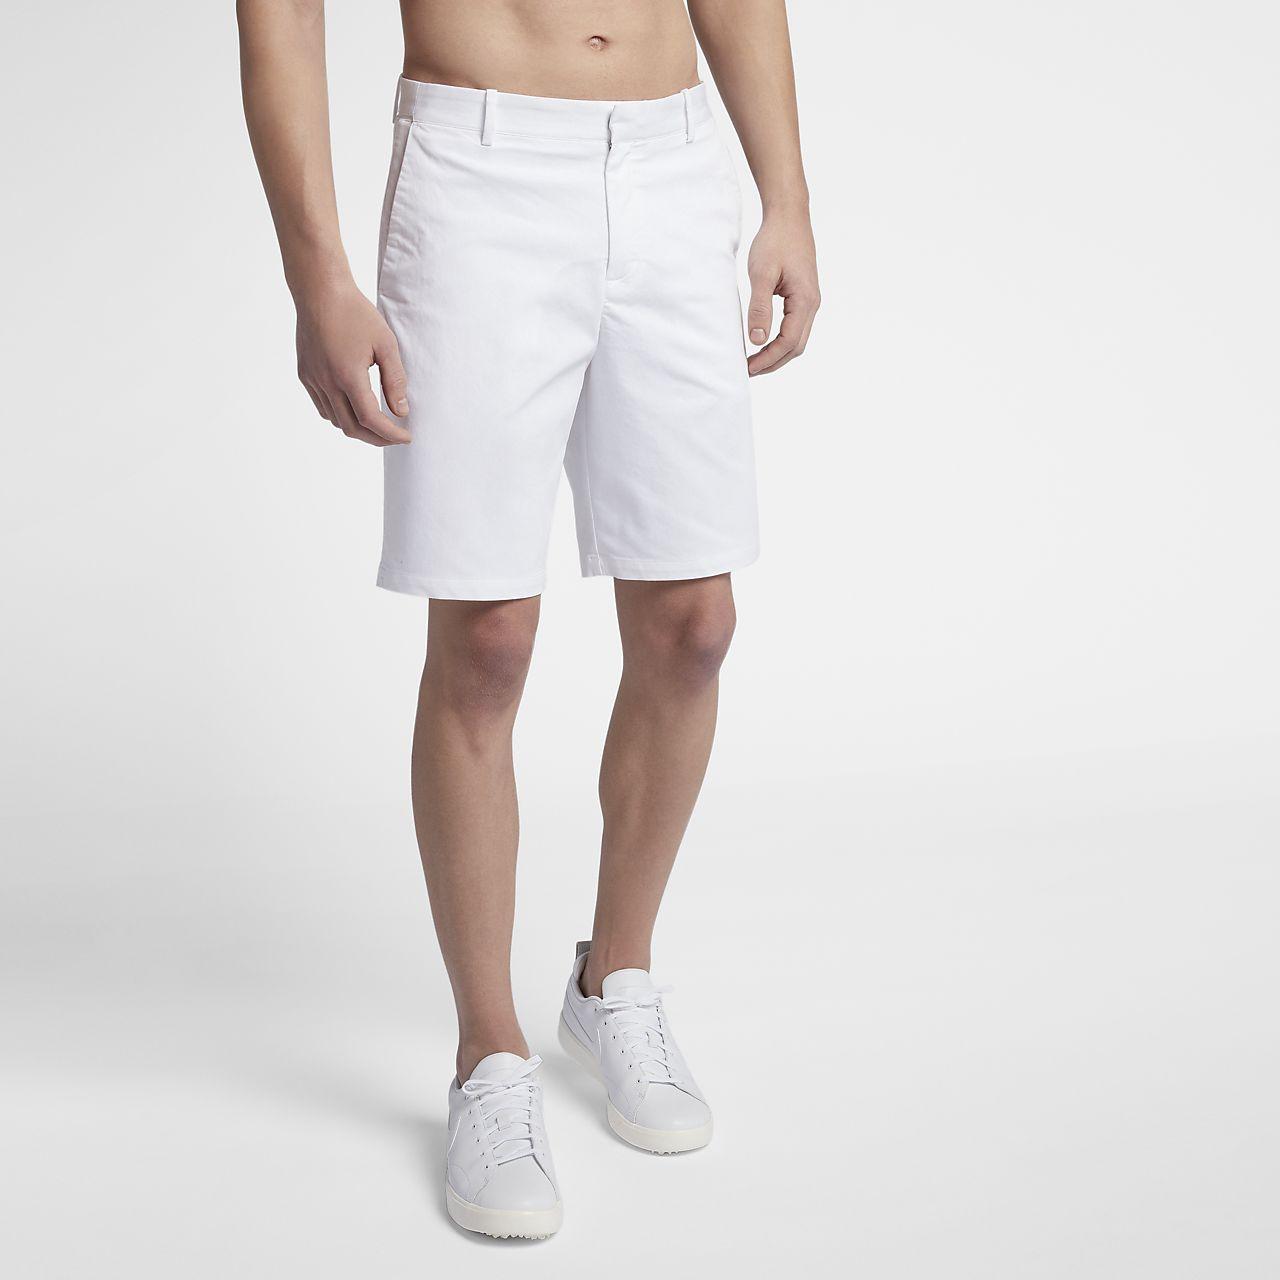 ... Nike Flex Men's Slim Golf Shorts